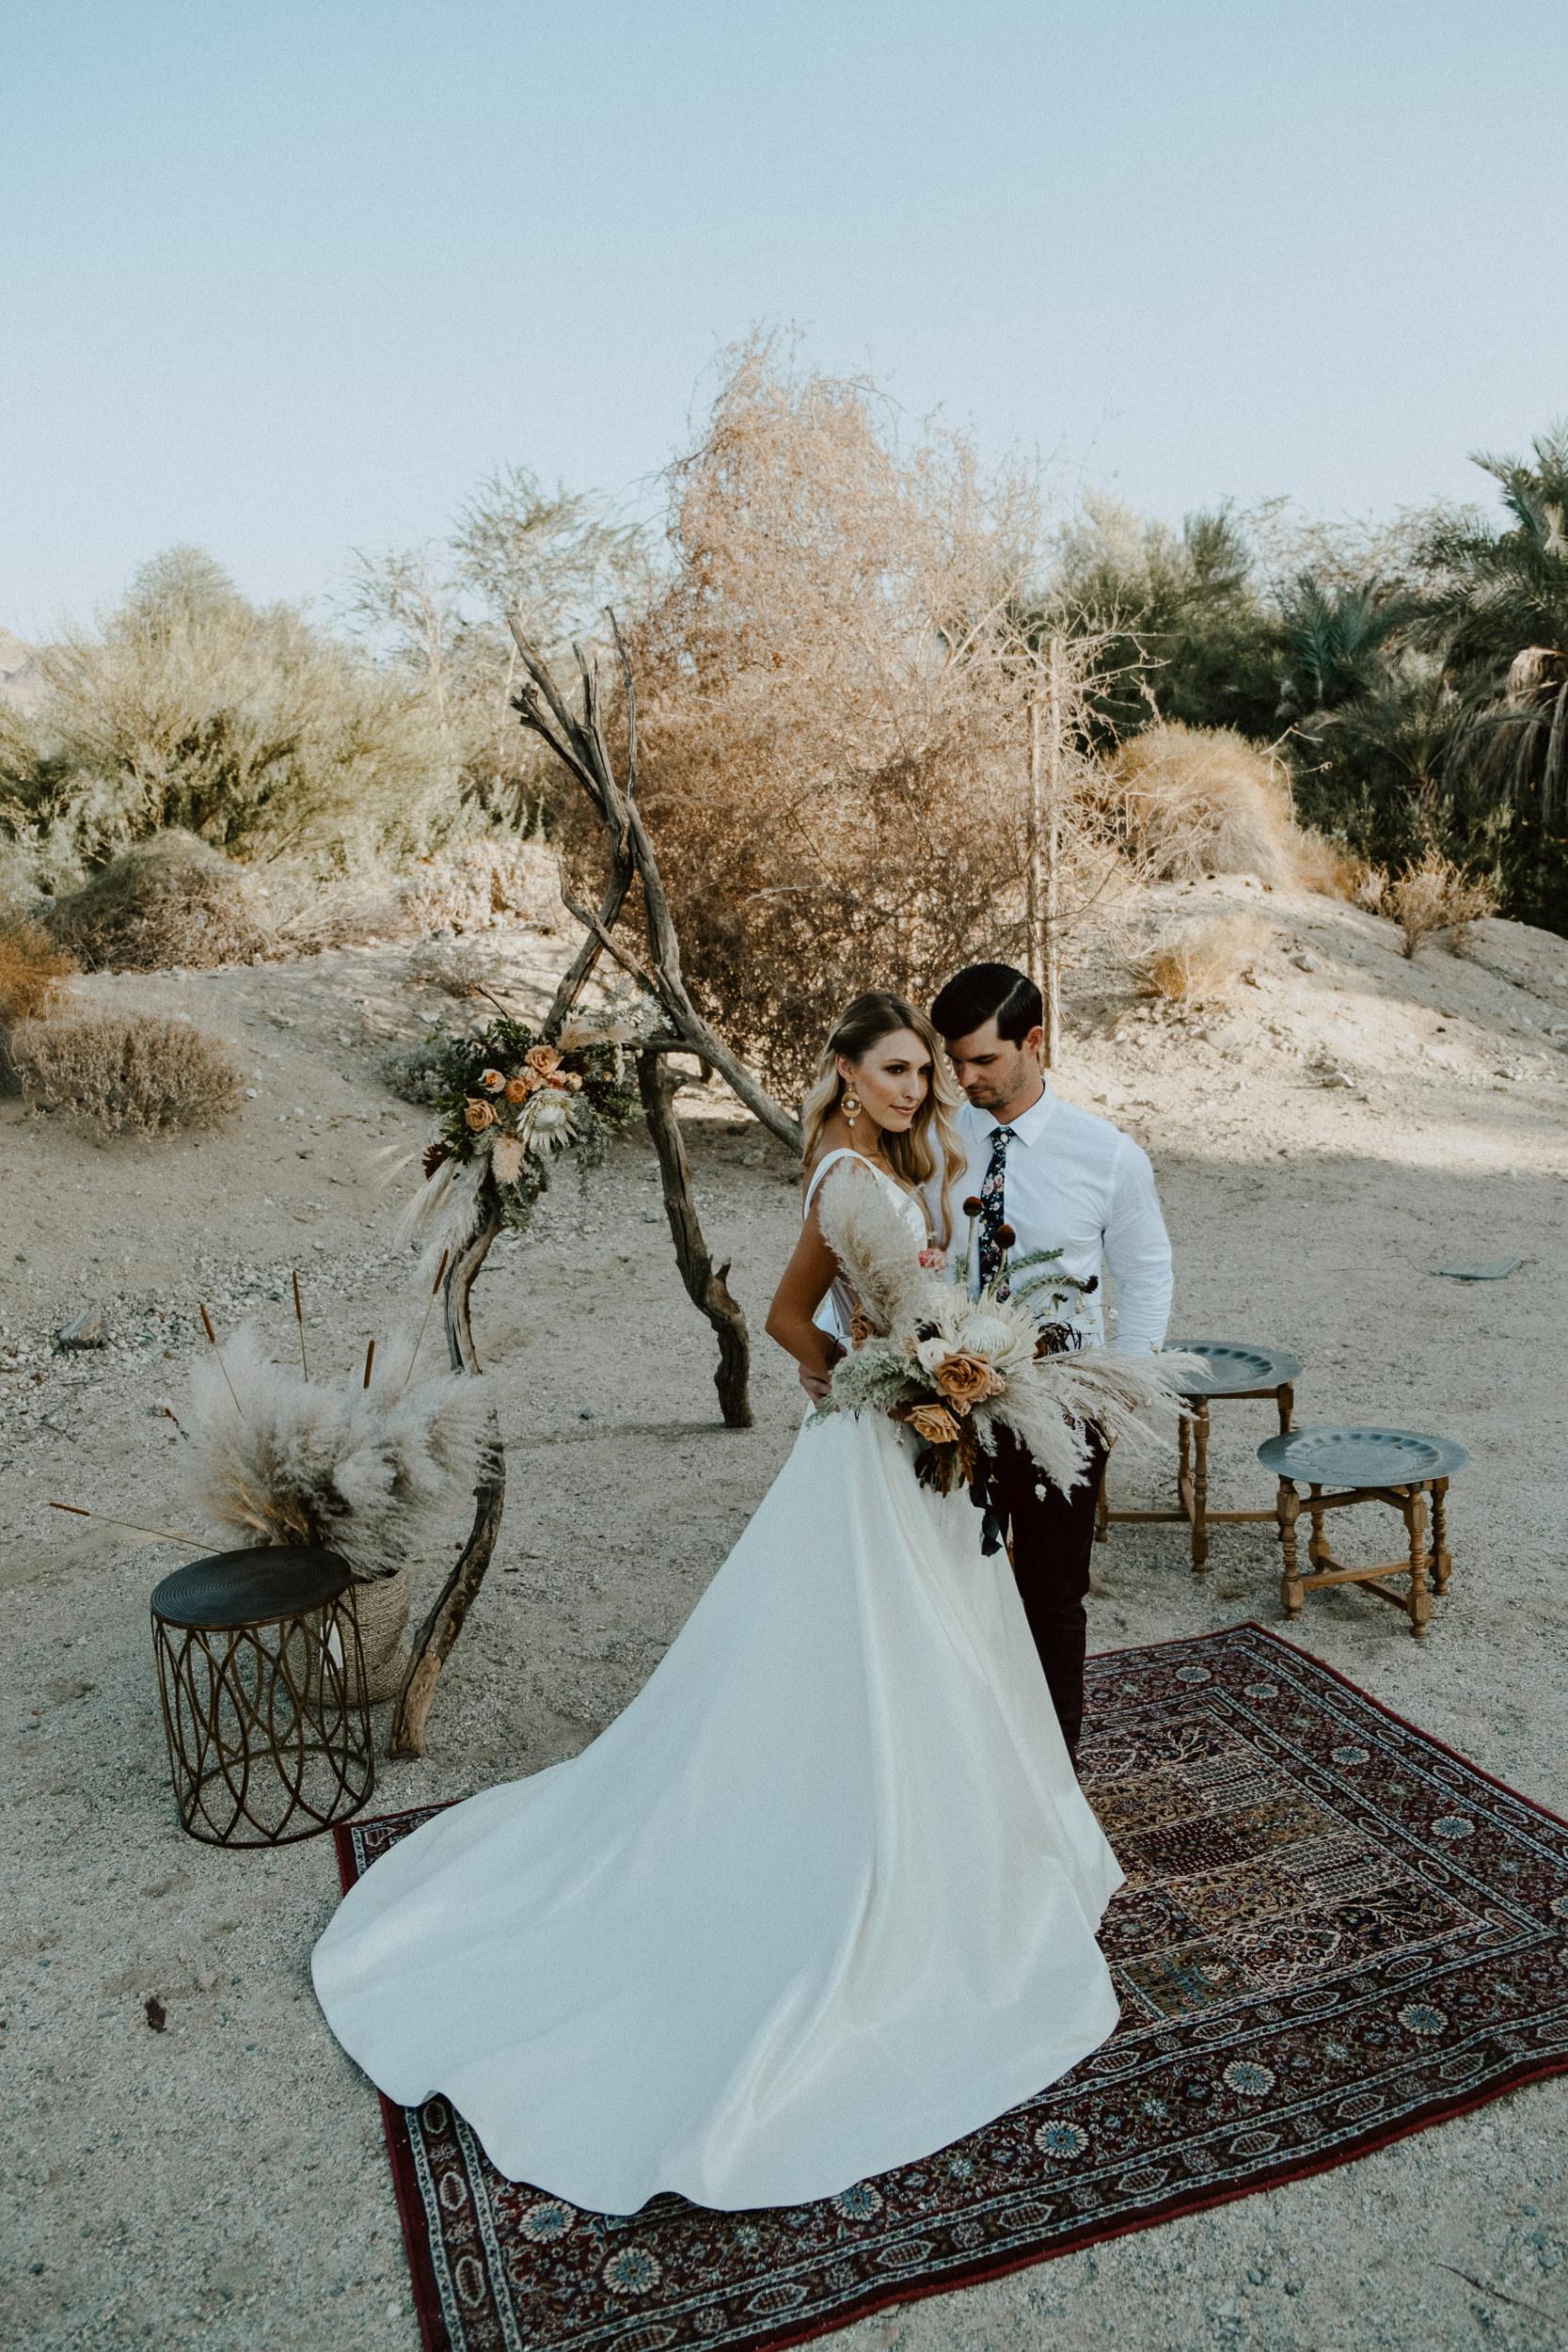 sChelsie + Chris - The Desert Shootout Wedding Romantics at The Living Desert-3.jpg